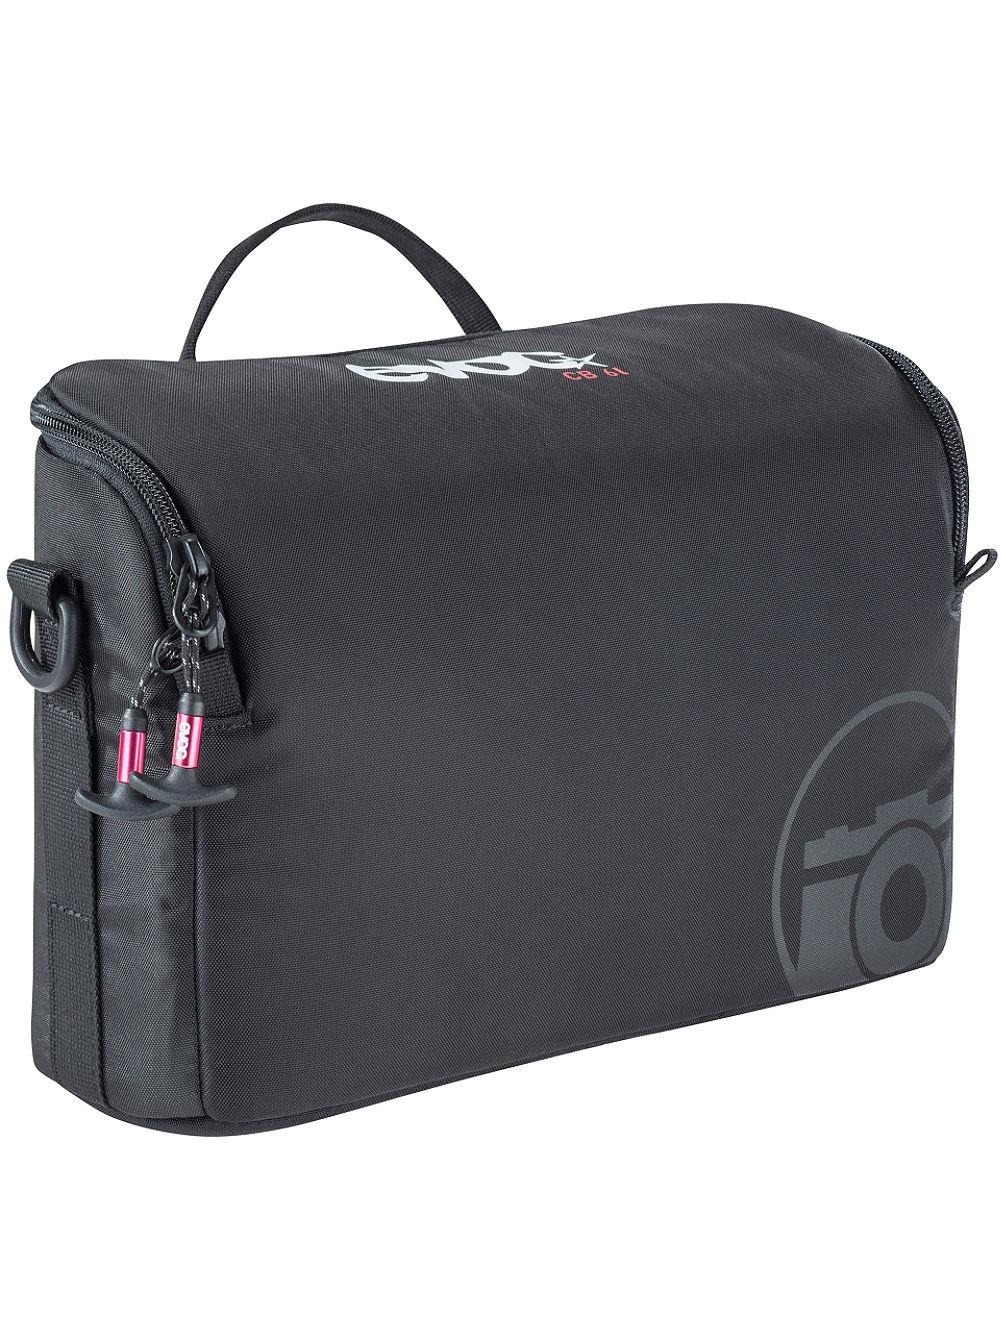 Evoc Camera Block 6L Backpack Nero- evoc - blue-tomato.com